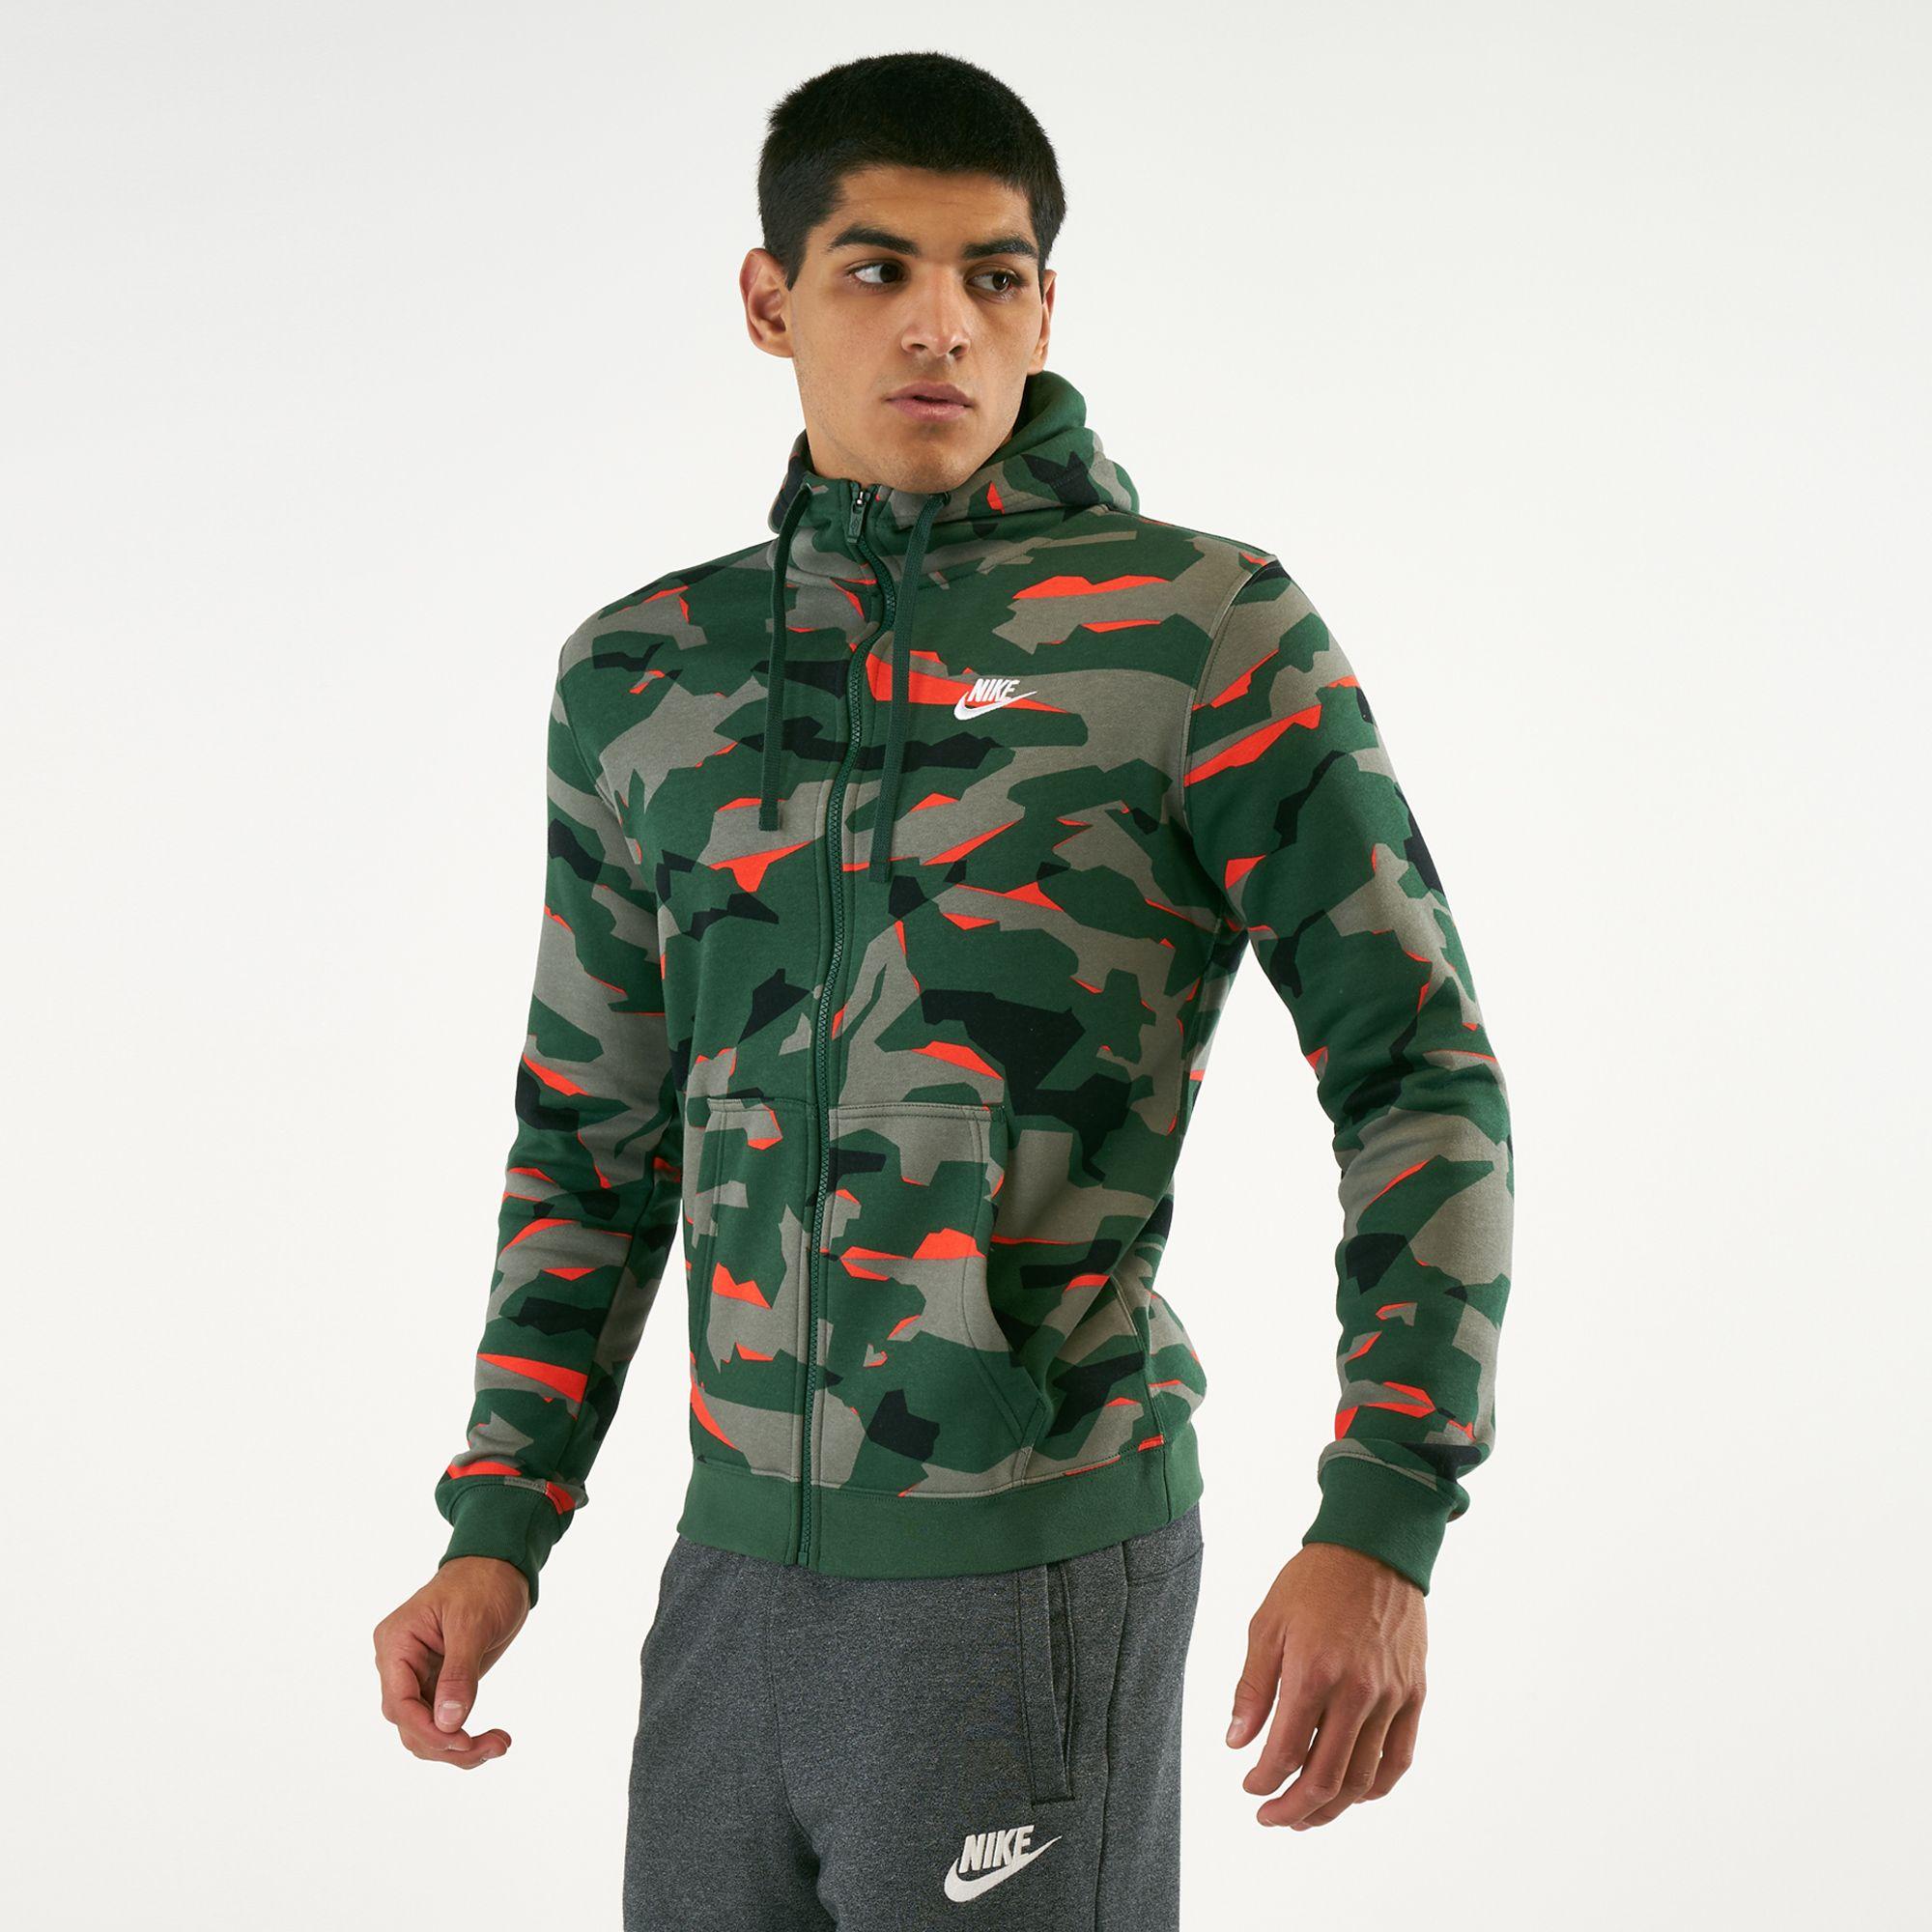 timeless design 1c820 e2d9d Nike Men s Sportswear Club Camo Hoodie   Hoodies   Hoodies and ...